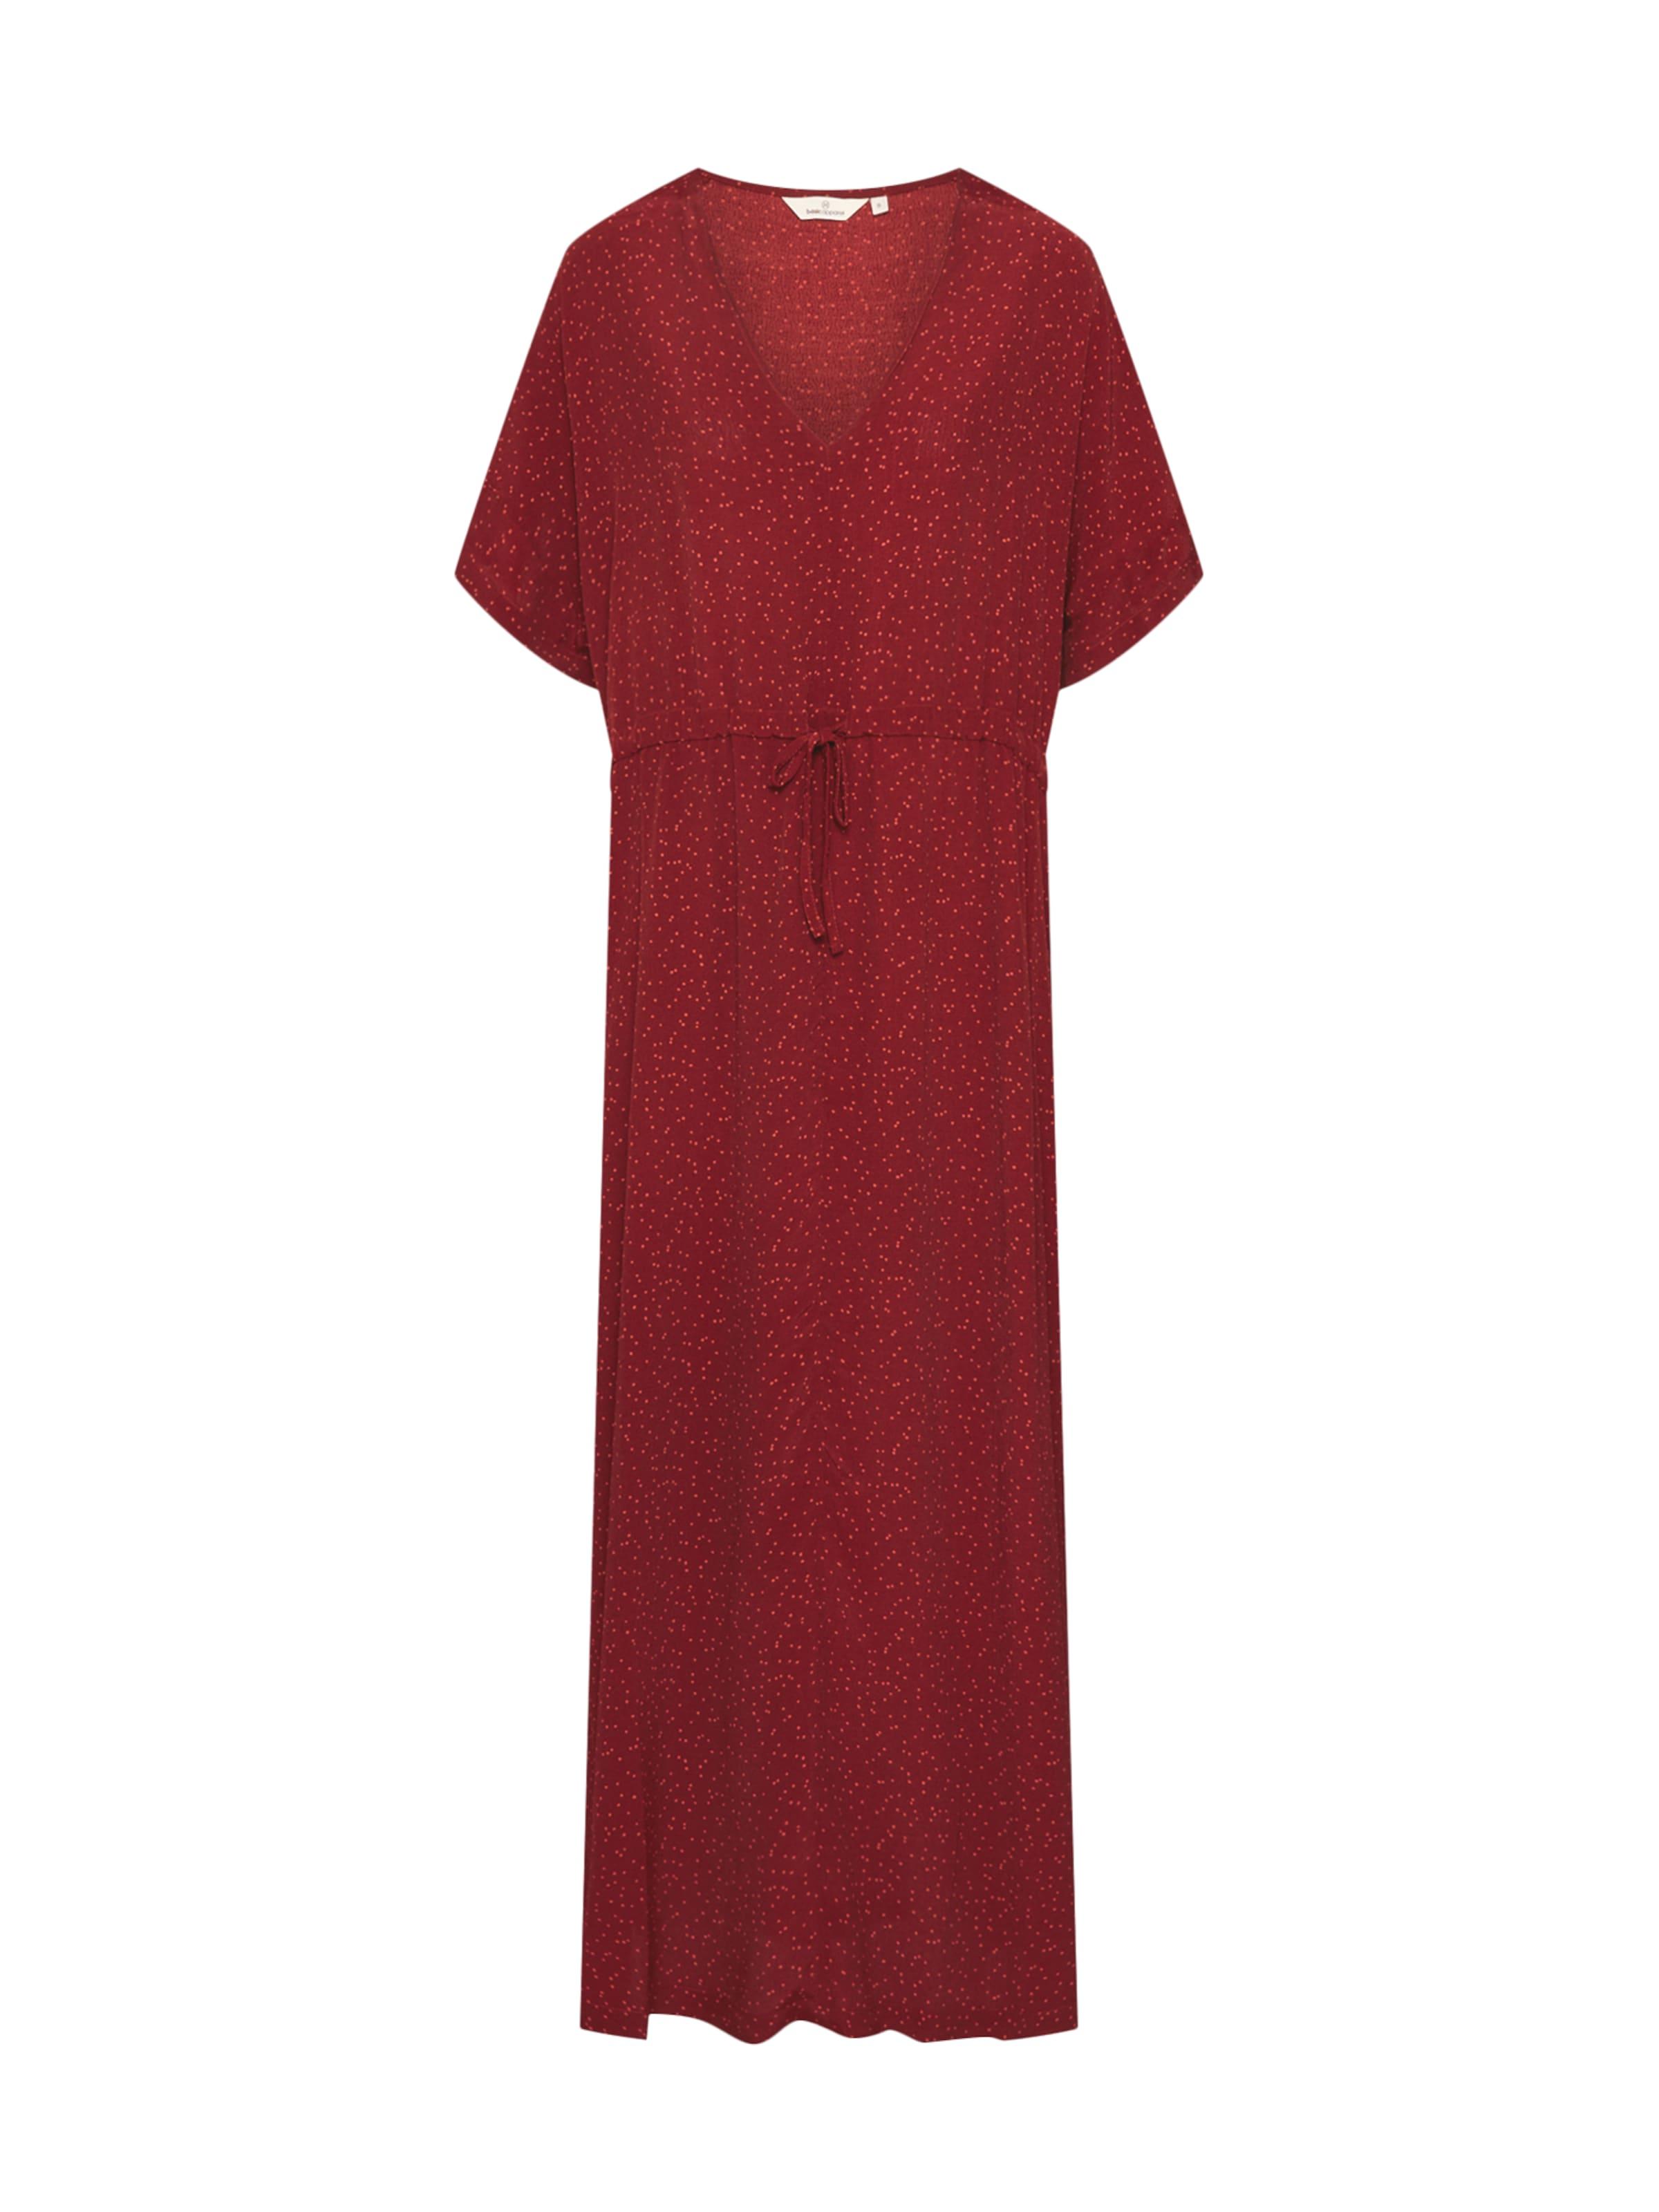 D'été Apparel Basic Robe Lie En Dress' Long 'anja De Vin LUVMzqpSG